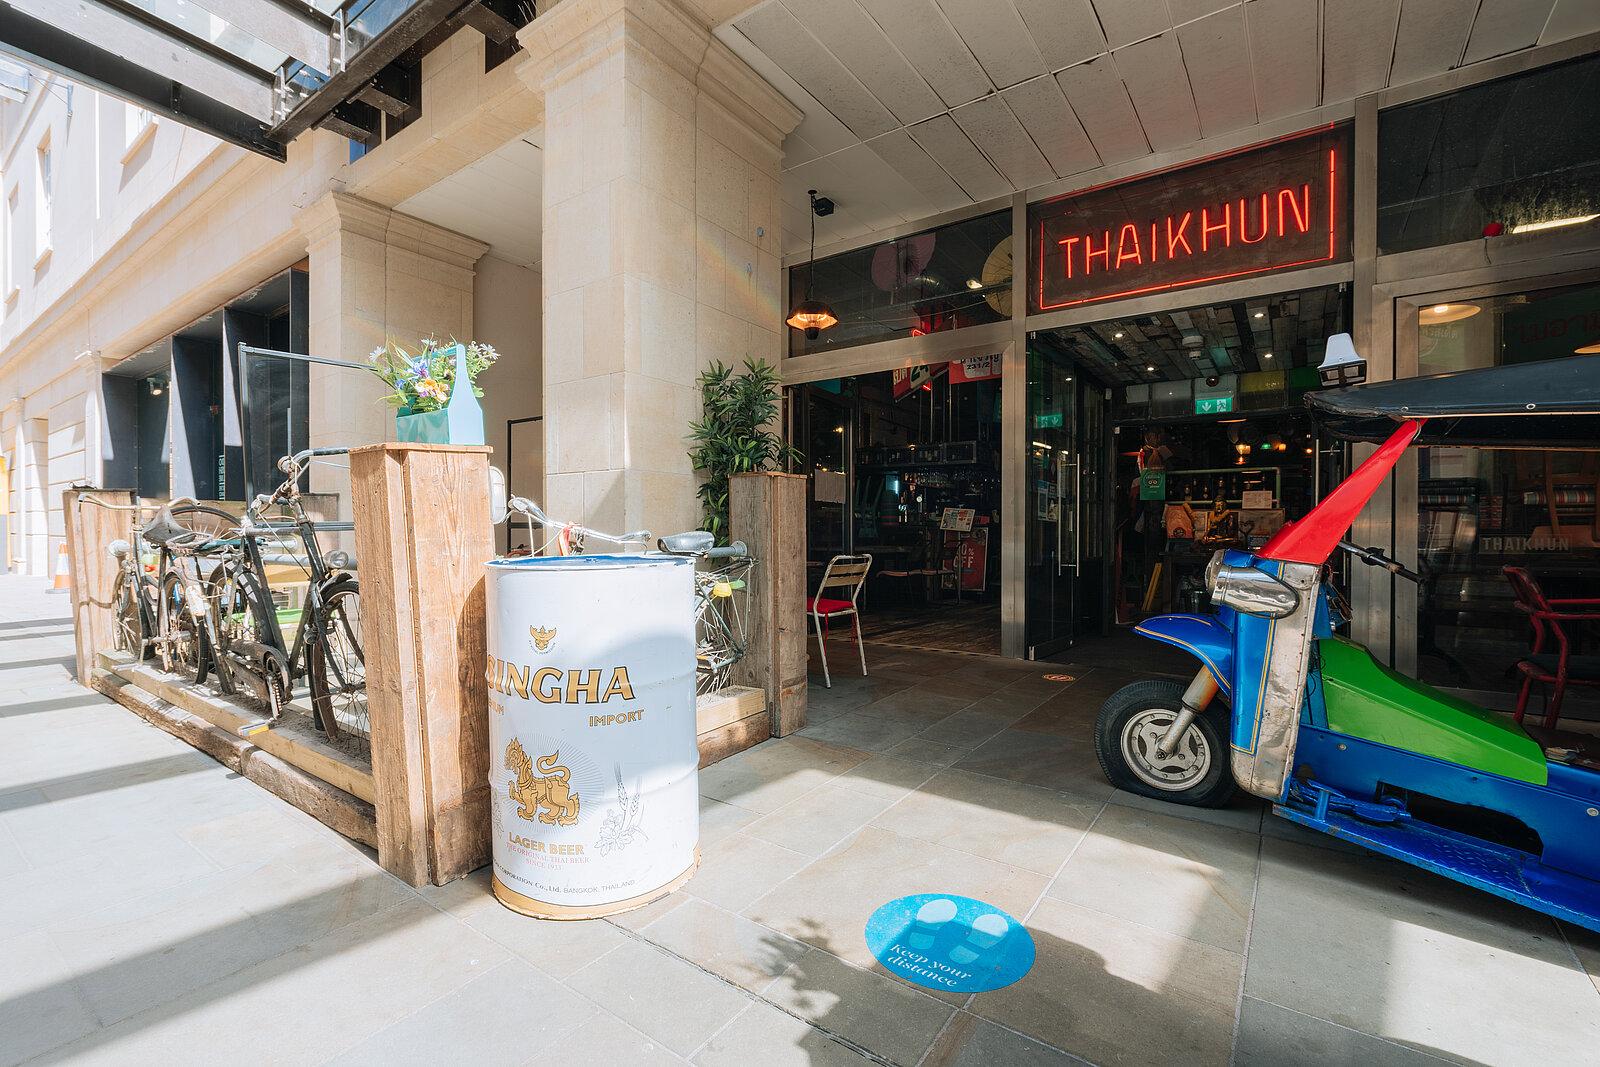 Thaikhun exterior restaurant front